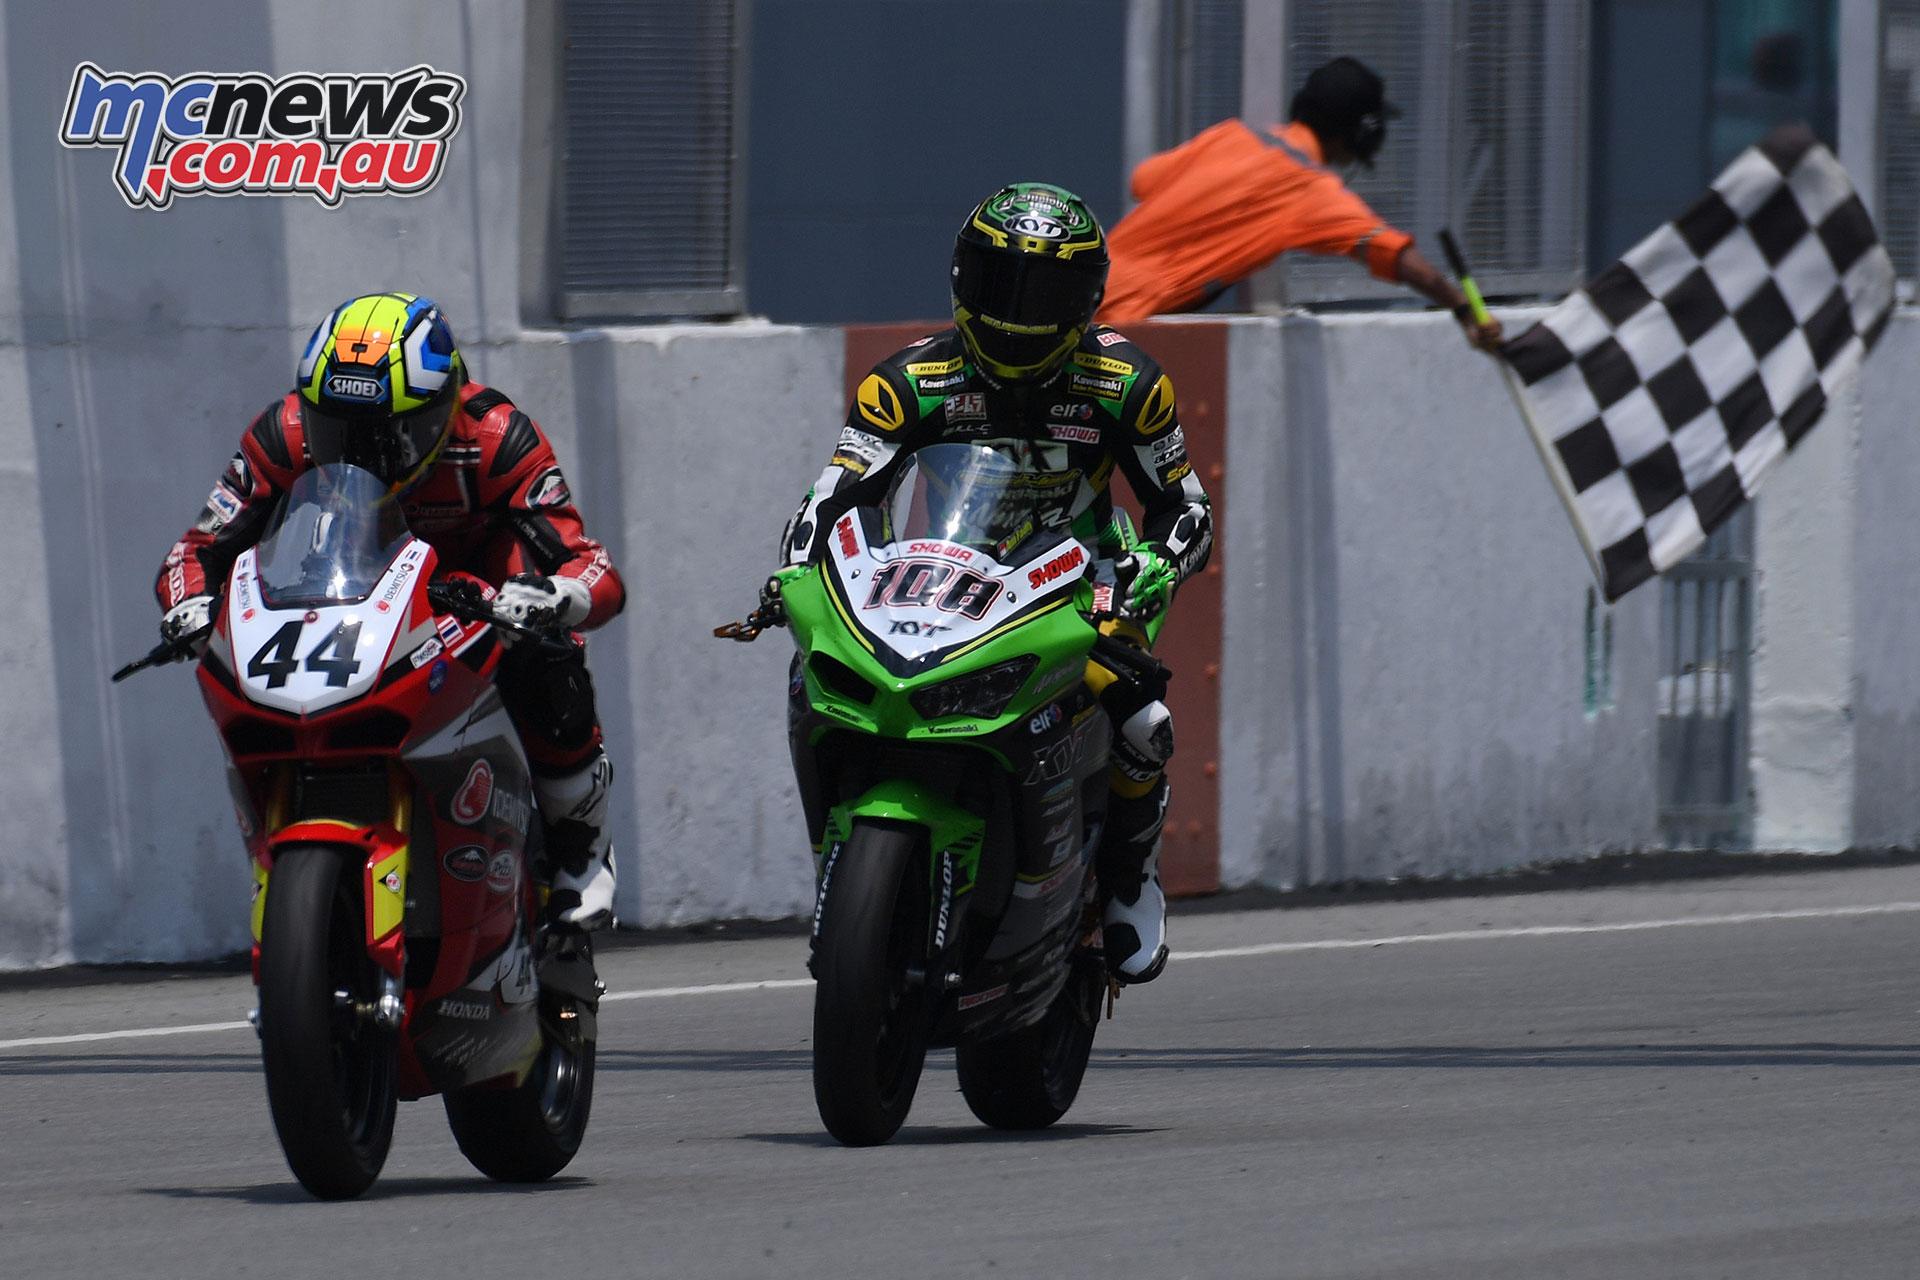 ARRC Rnd Muklada Sarapuech Andy Fadly Chequered Flag Race ARRC Sepang